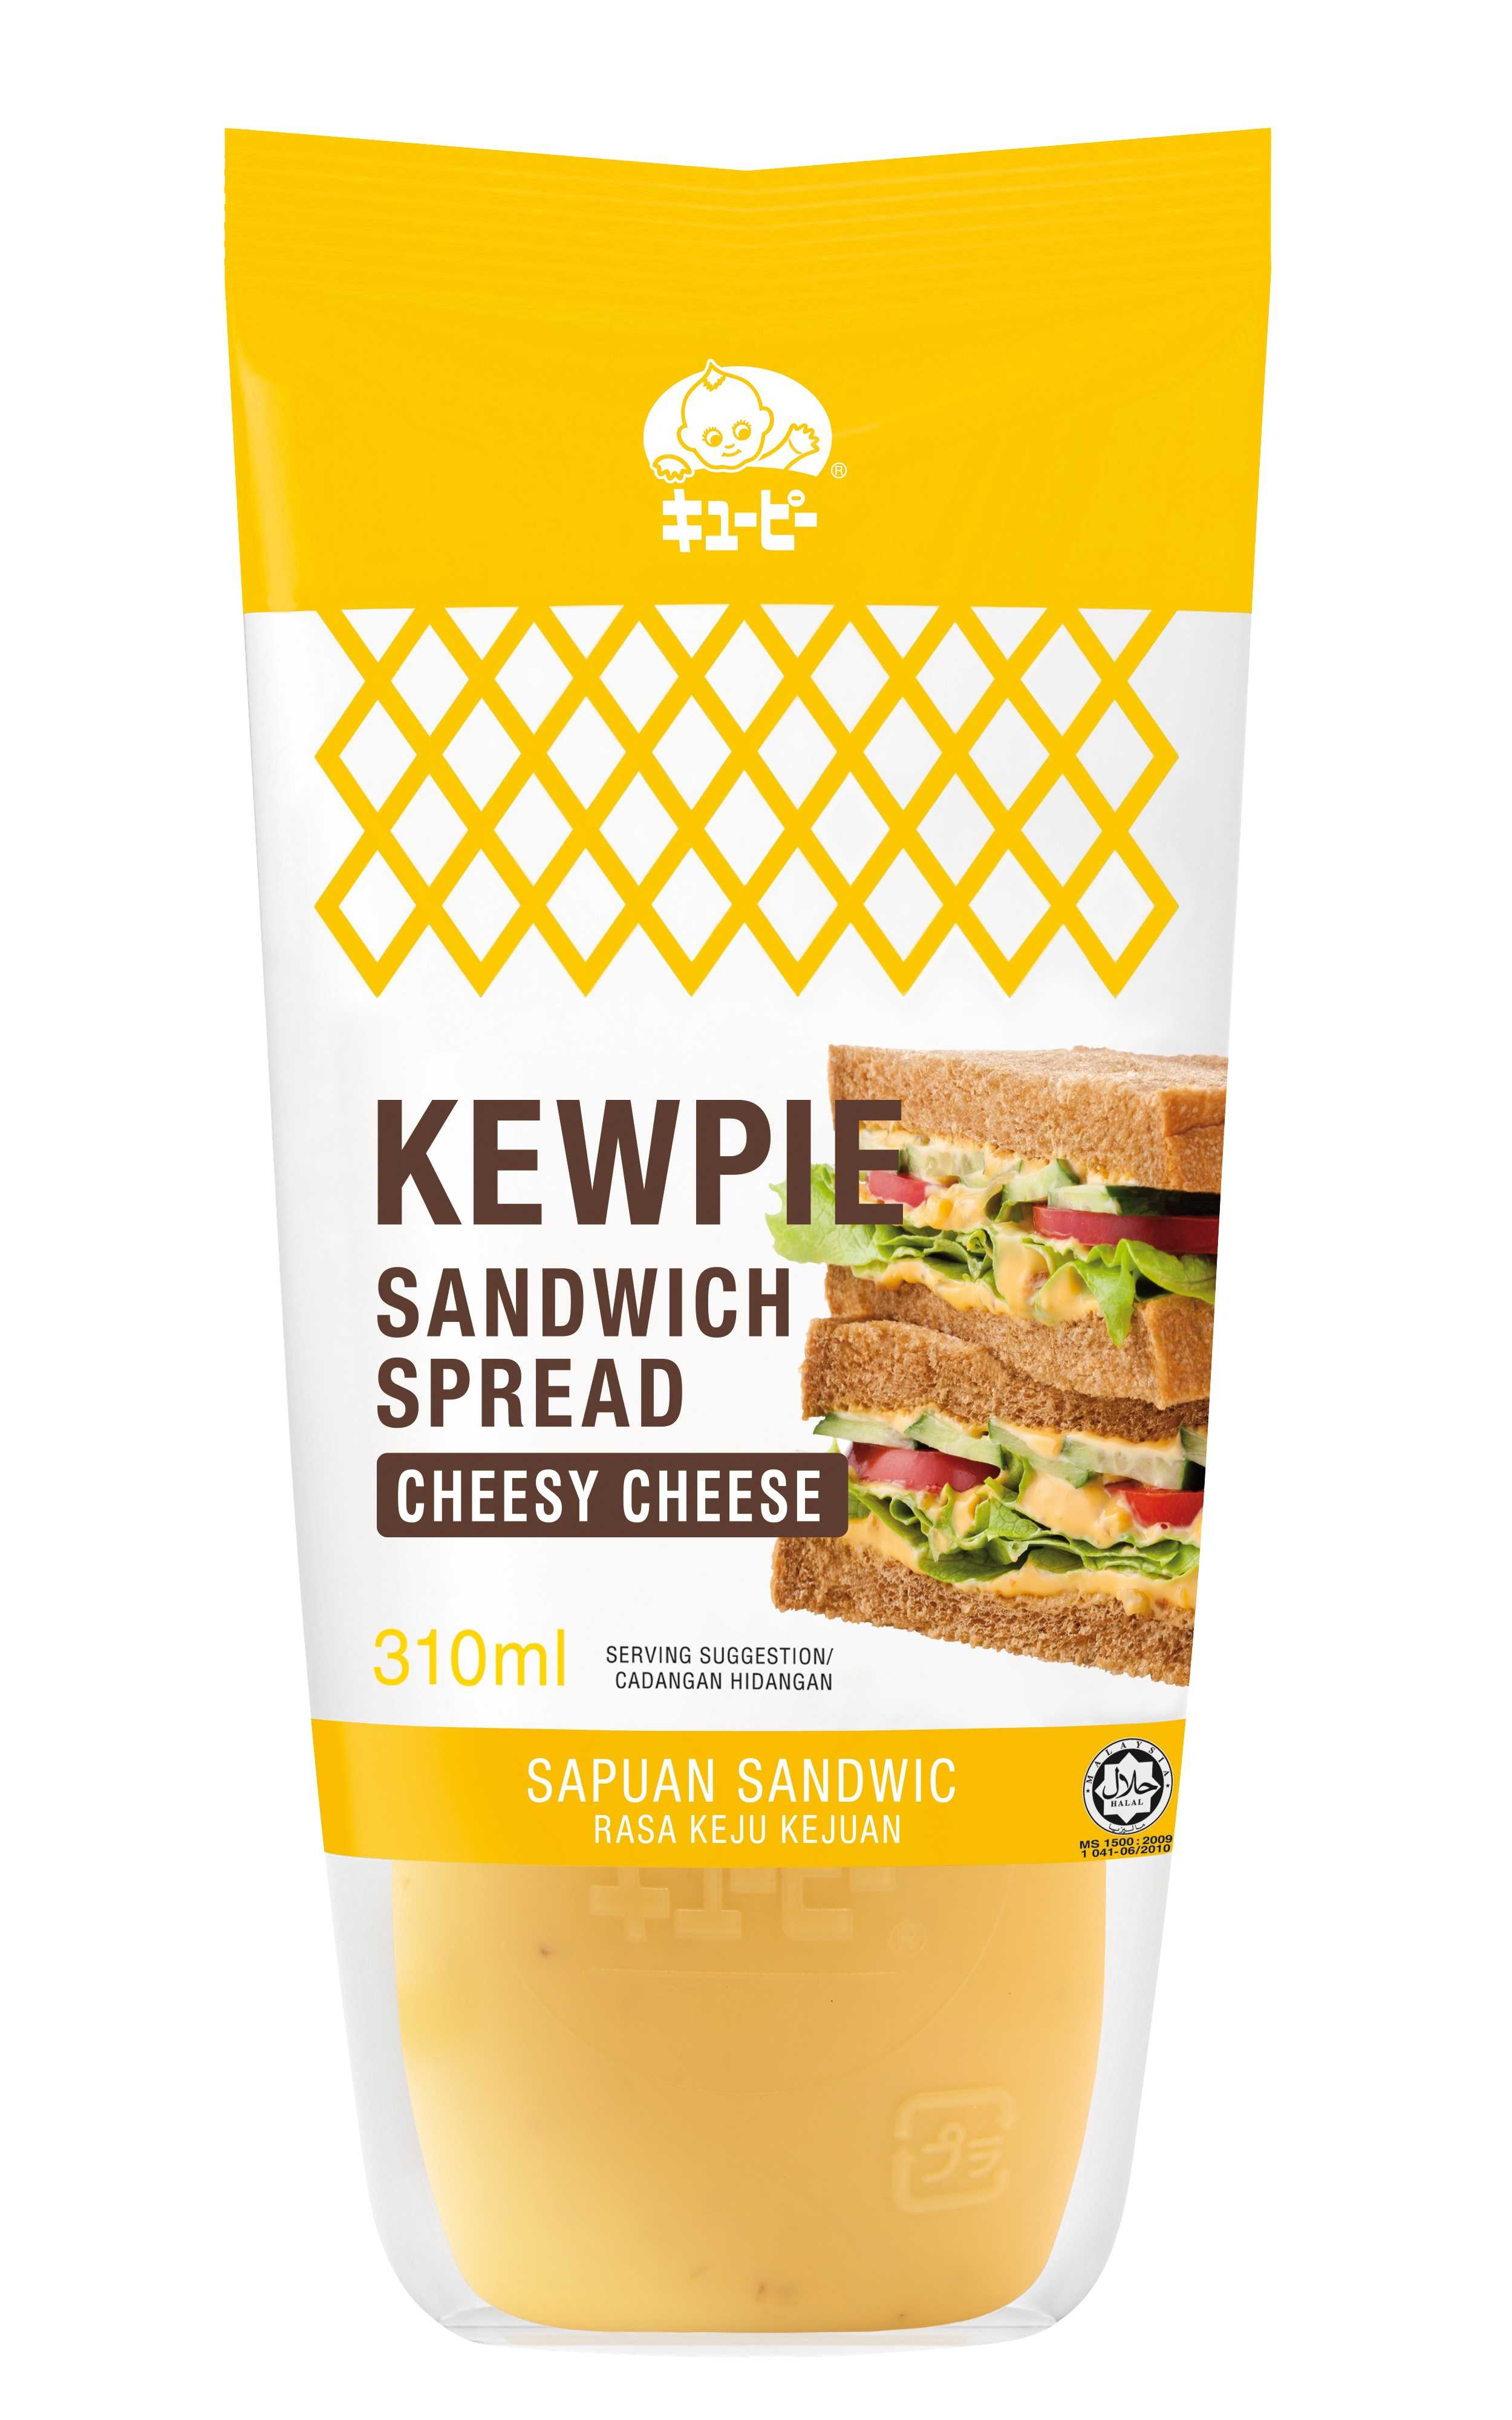 Kewpie Sandwich Spread Cheesy Cheese 310 ml